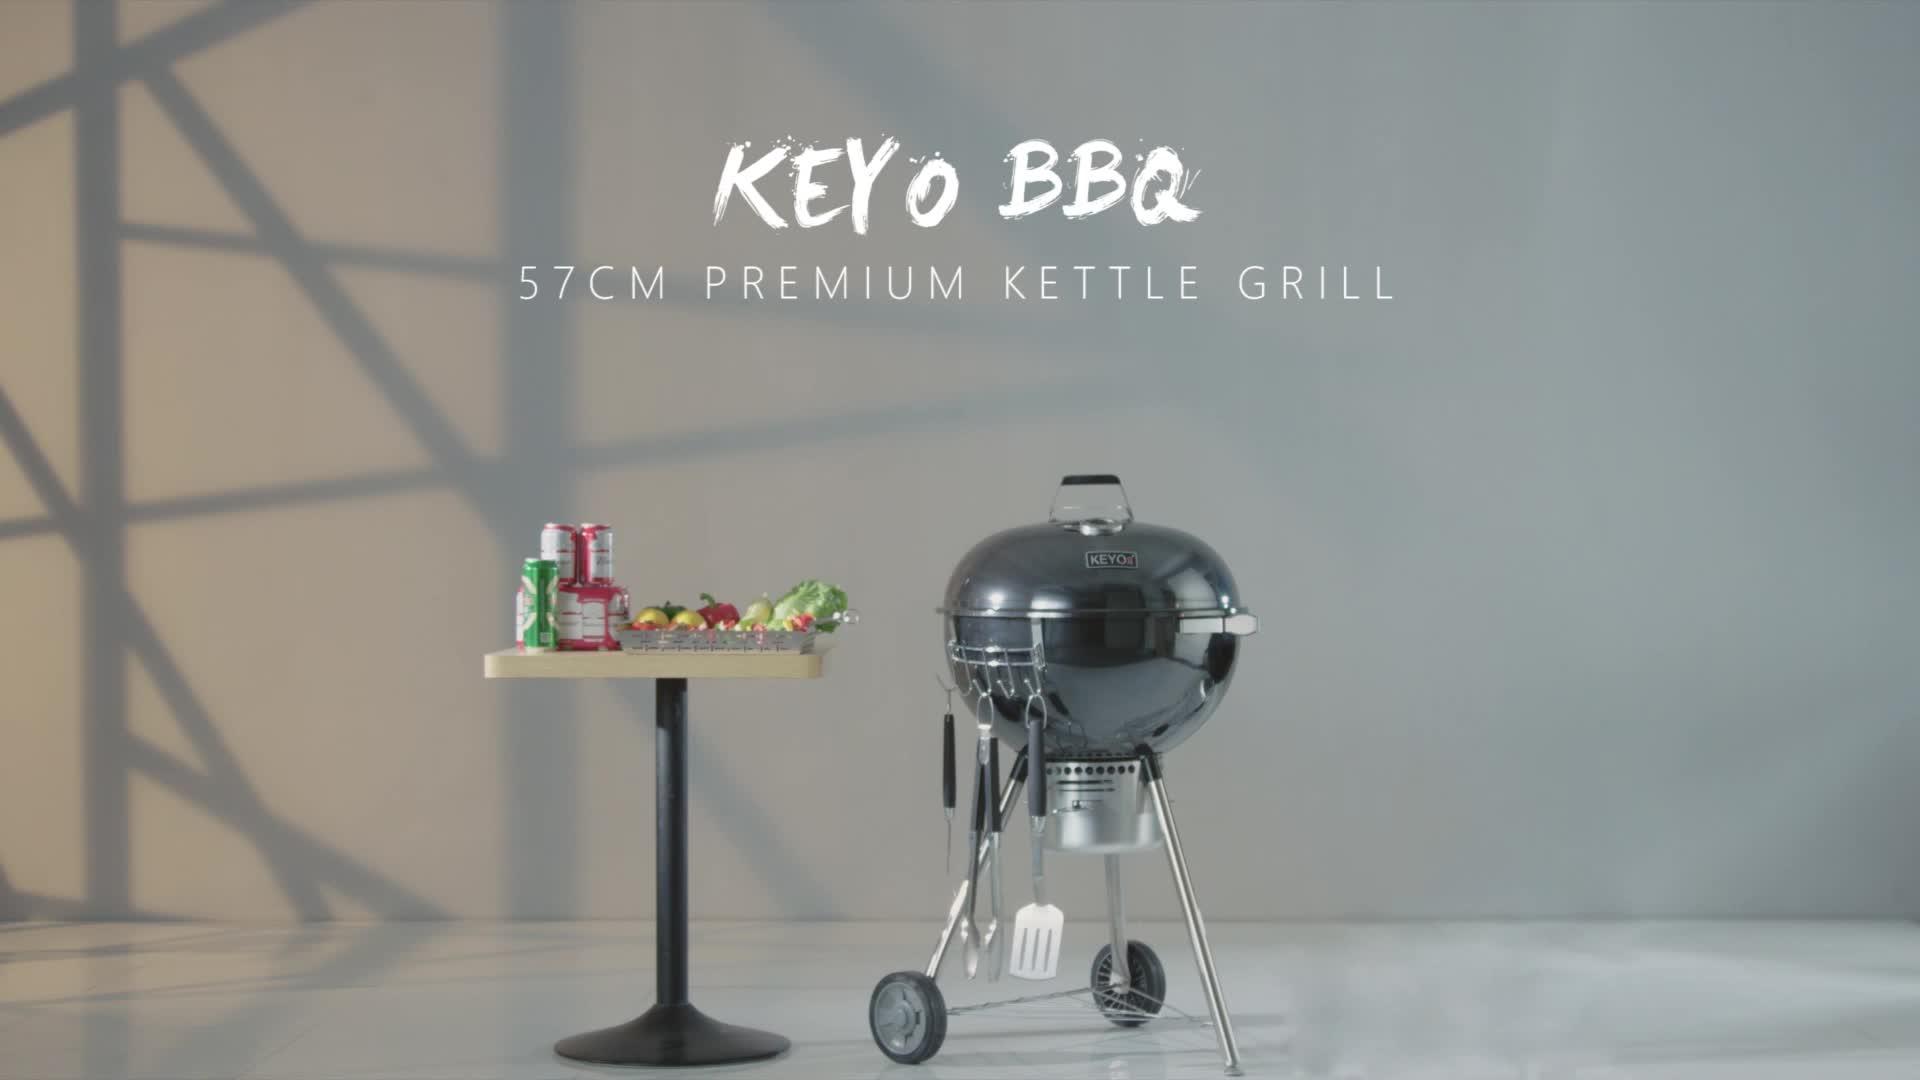 2019 वेबर गर्म बेच काले वेबर केतली लकड़ी का कोयला बारबेक्यू BBQ Grills